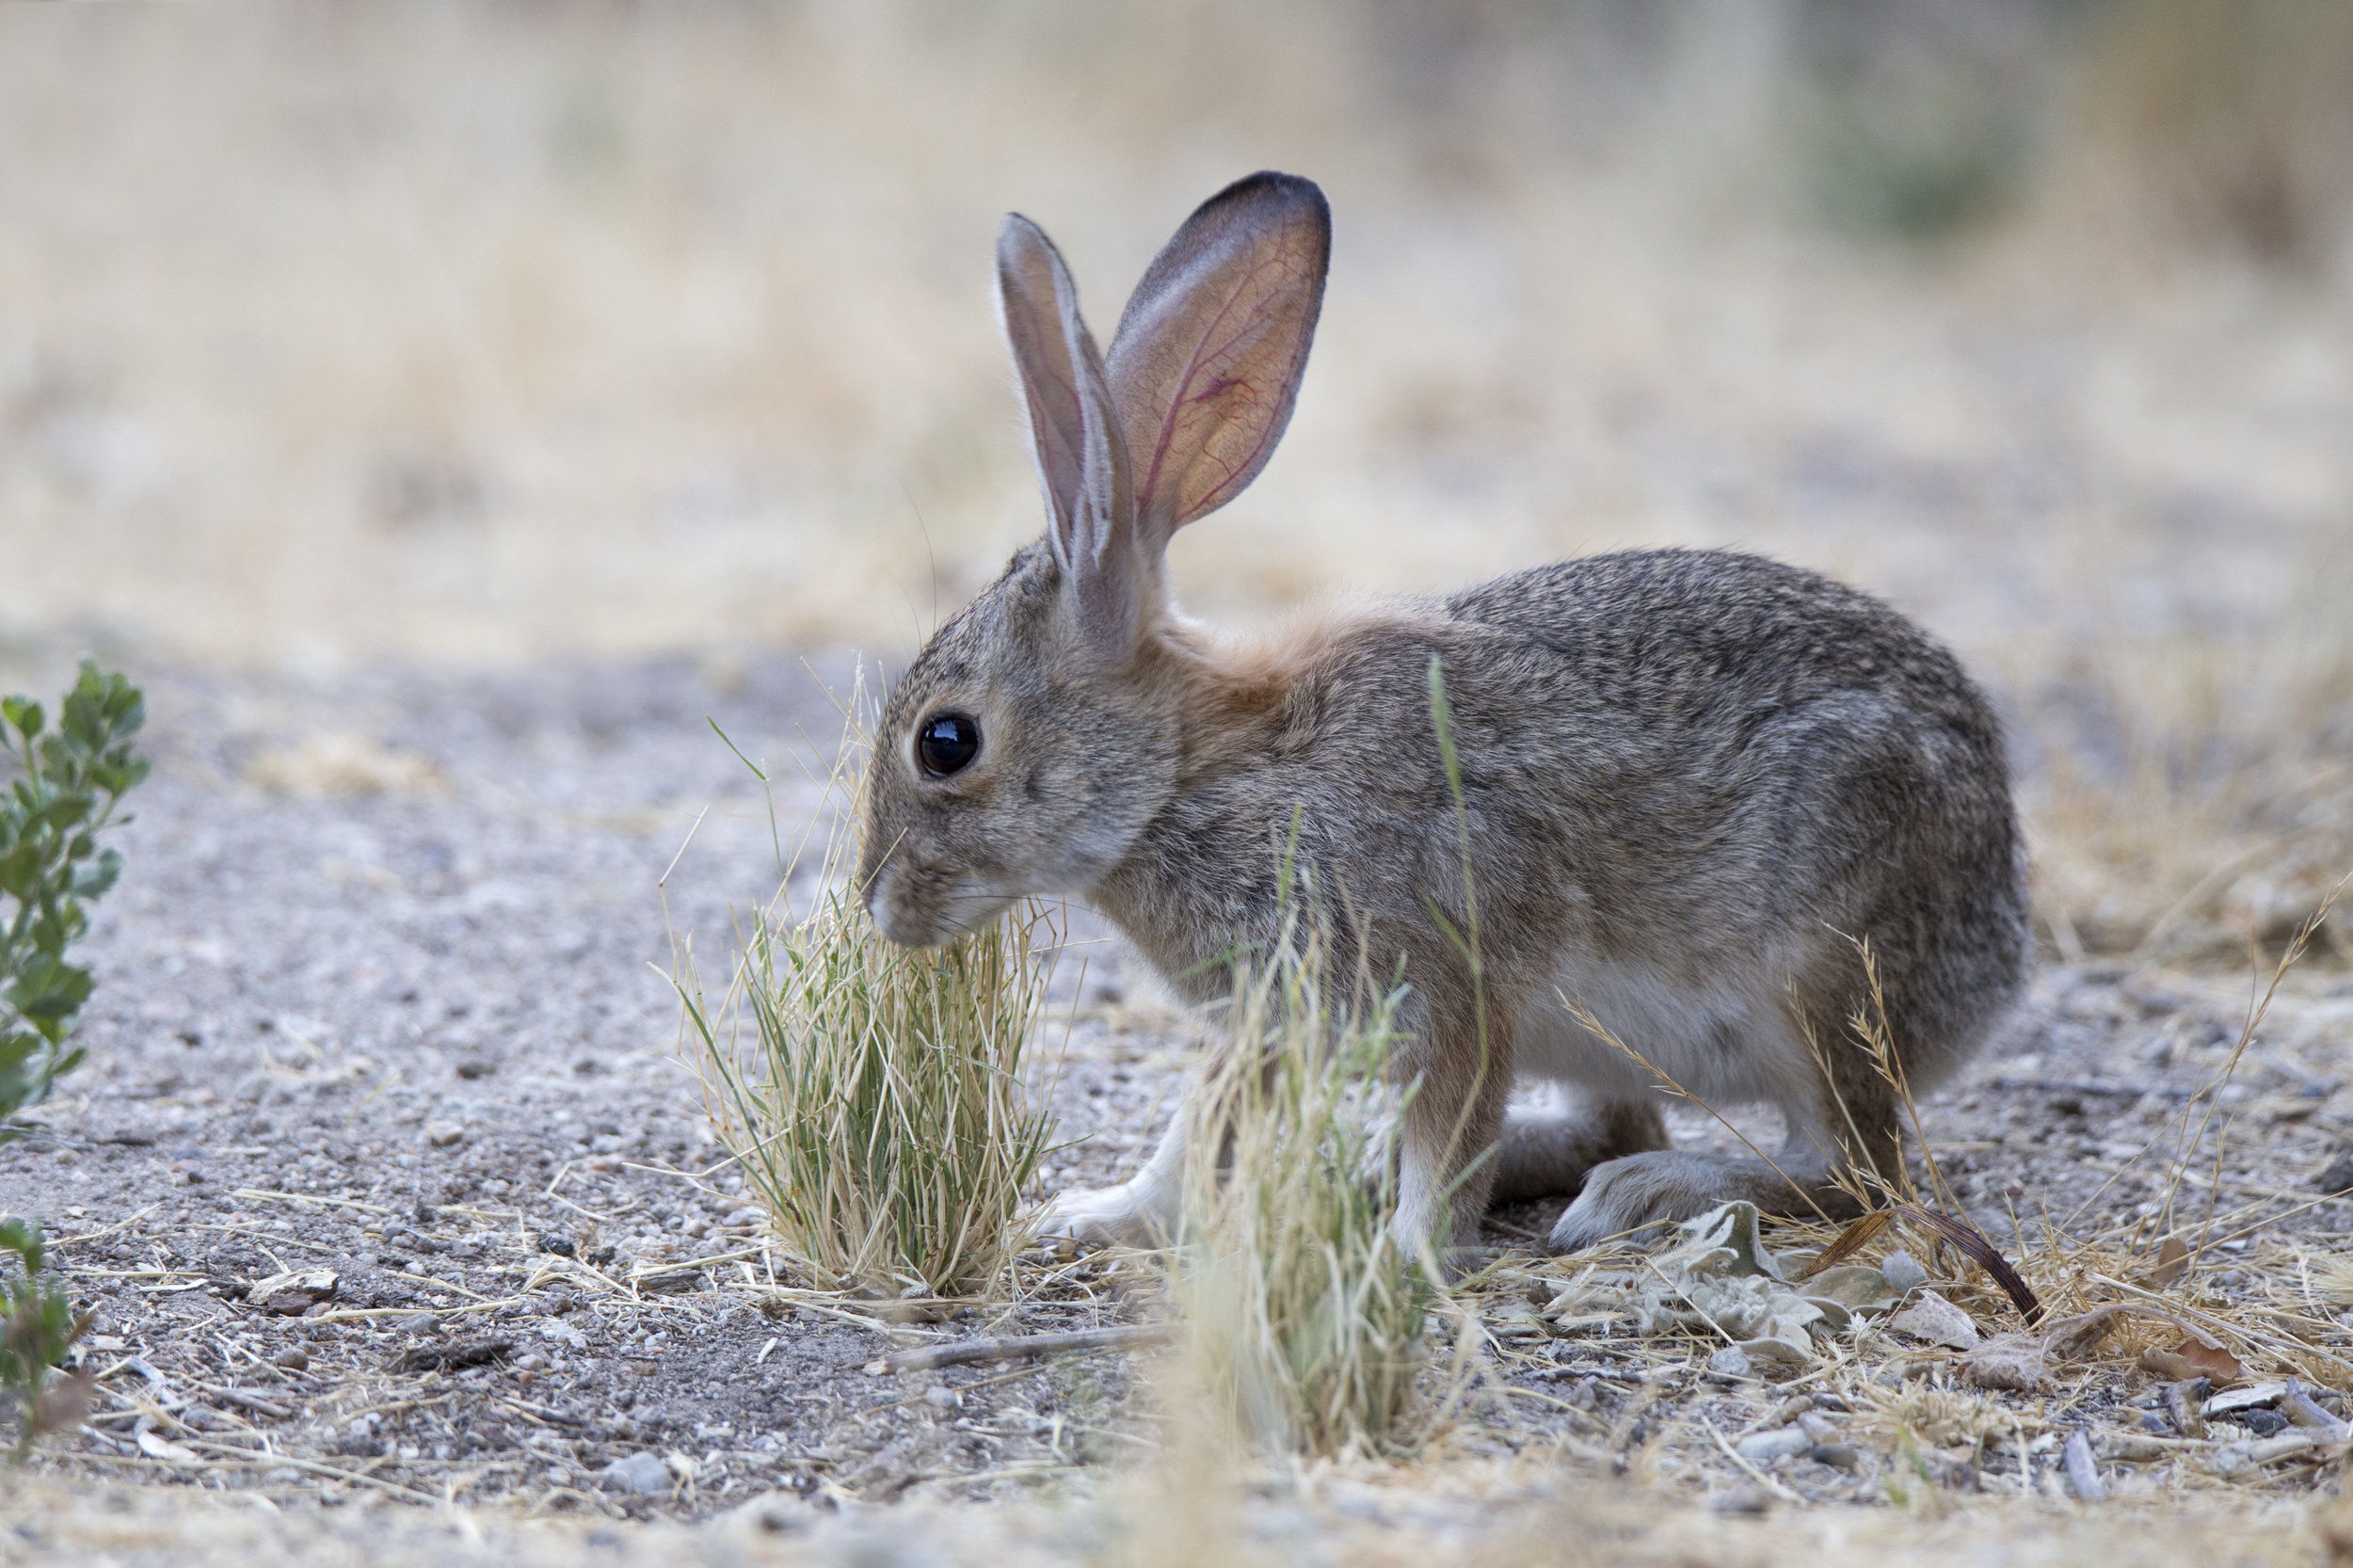 pinnacles_rabbit1.jpg